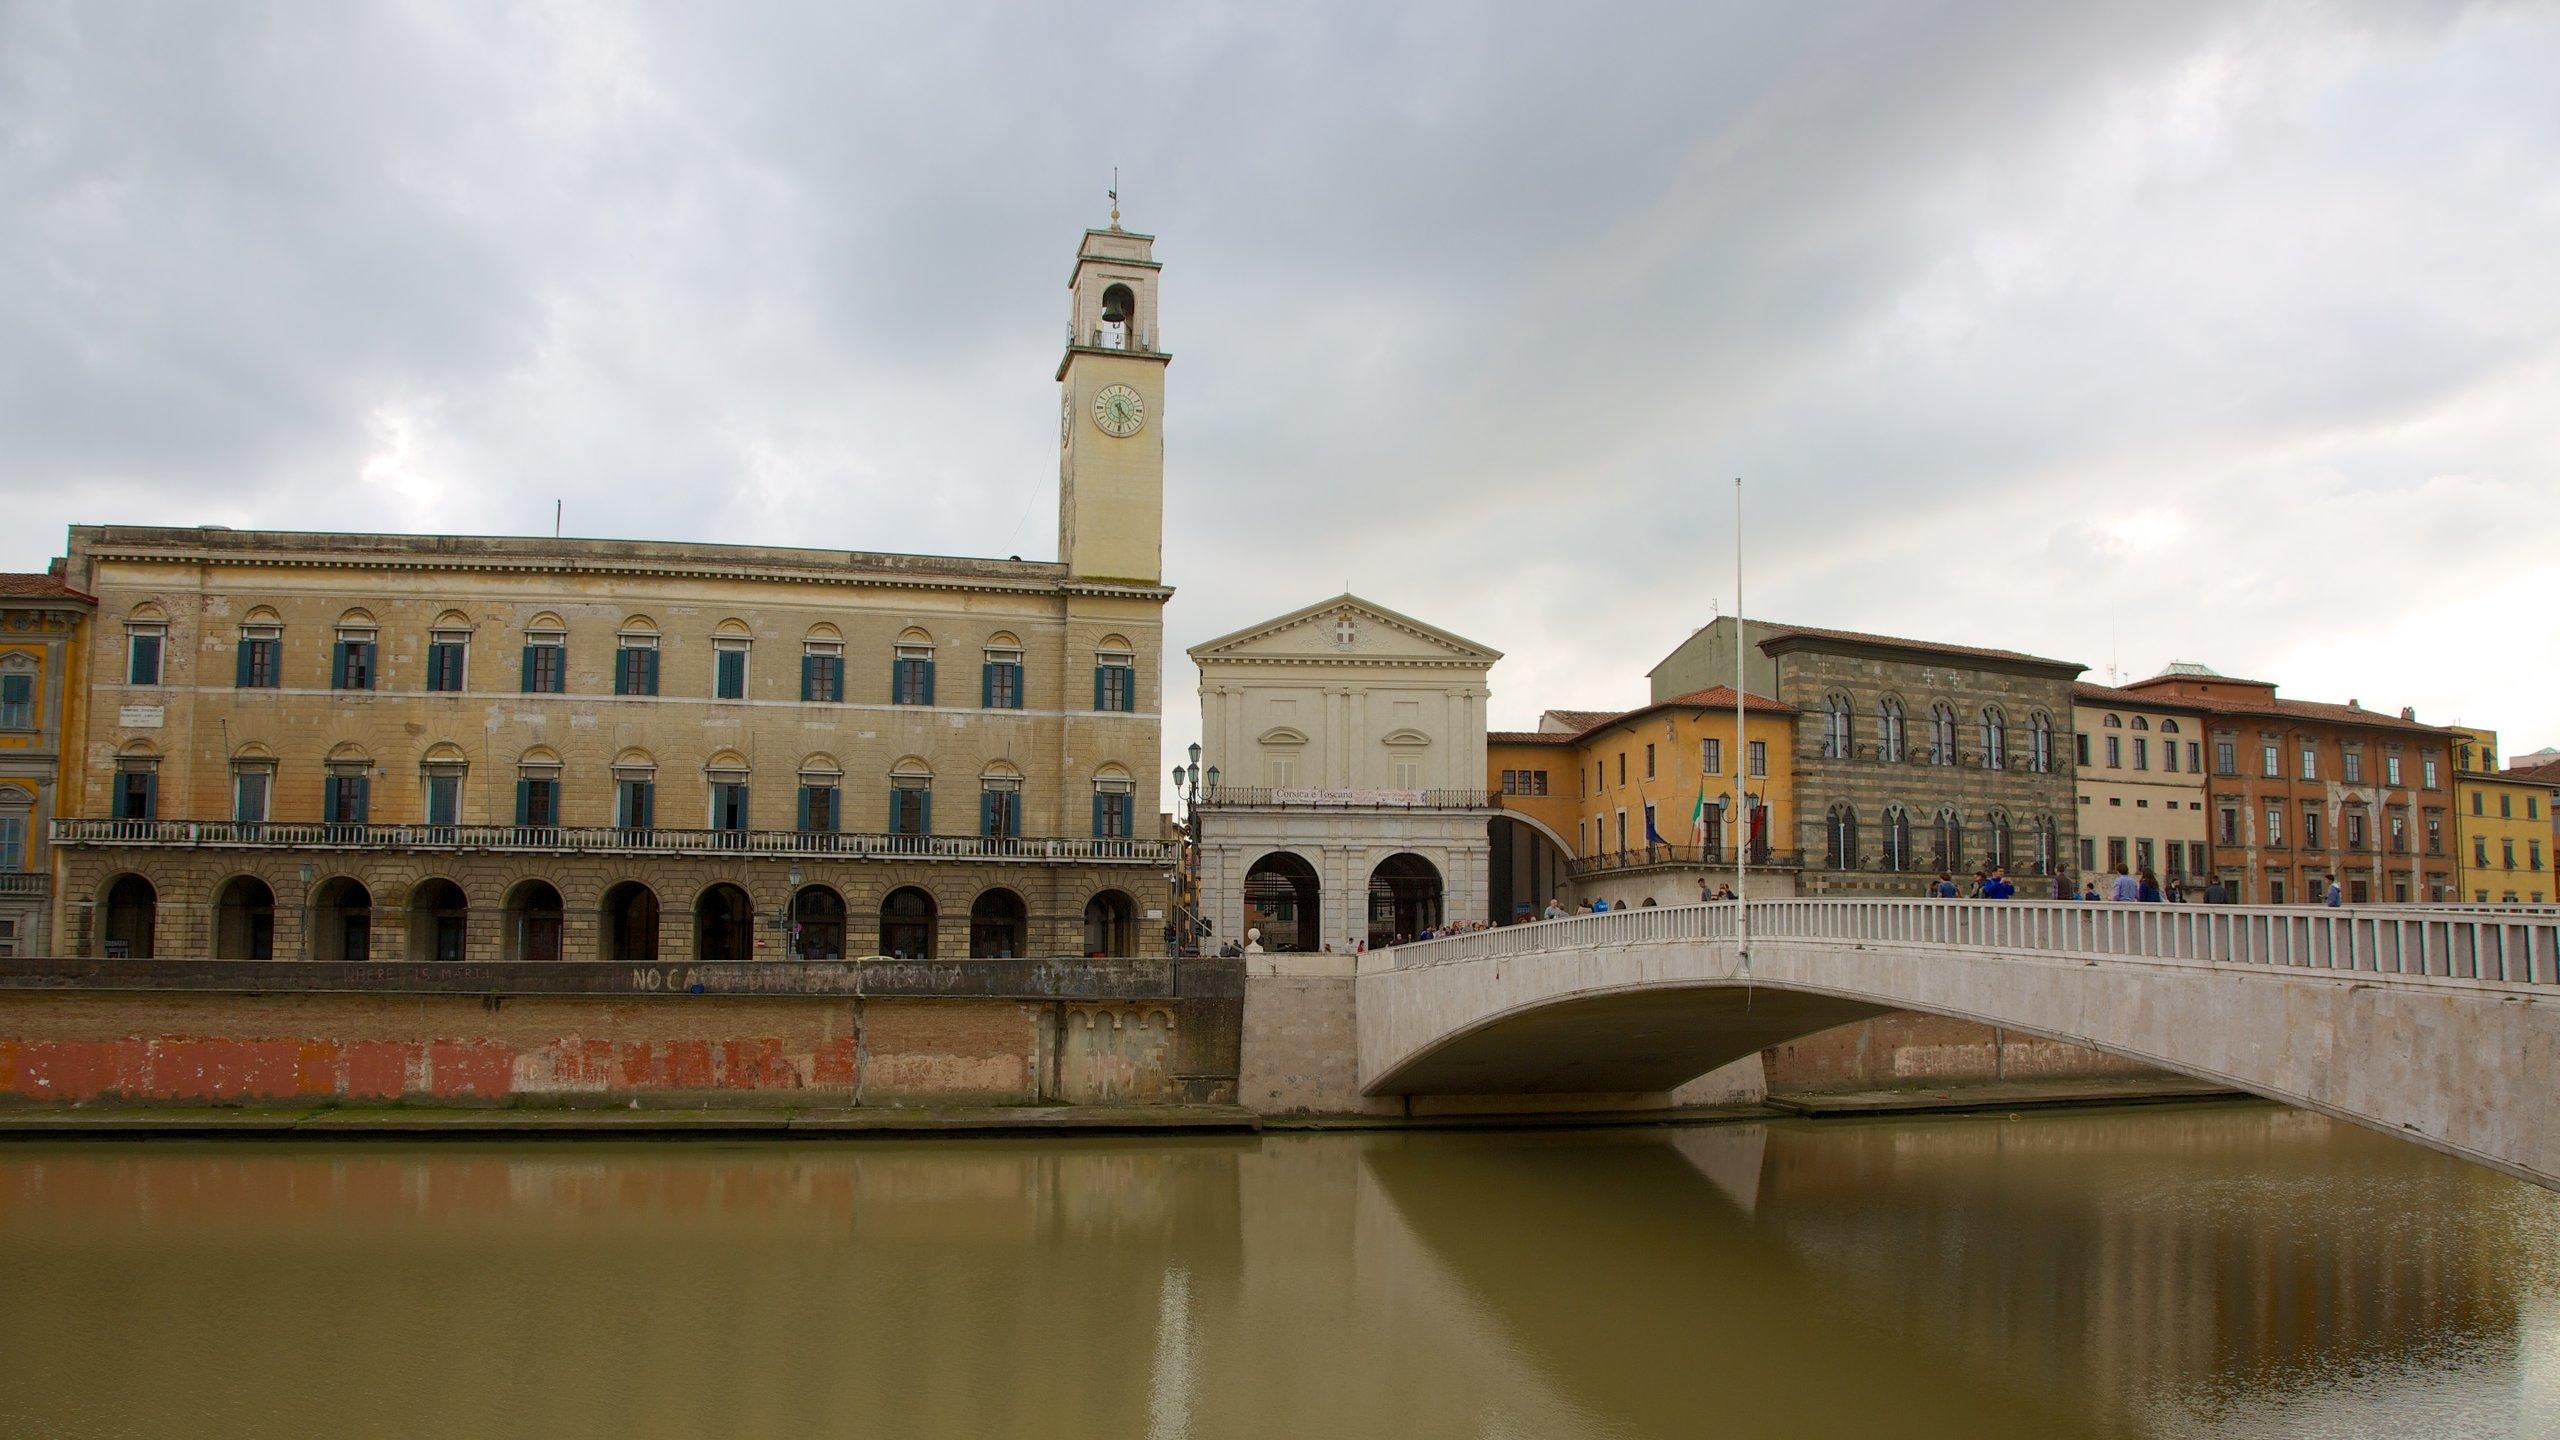 Centro Storico, Palermo, Sicily, Italy